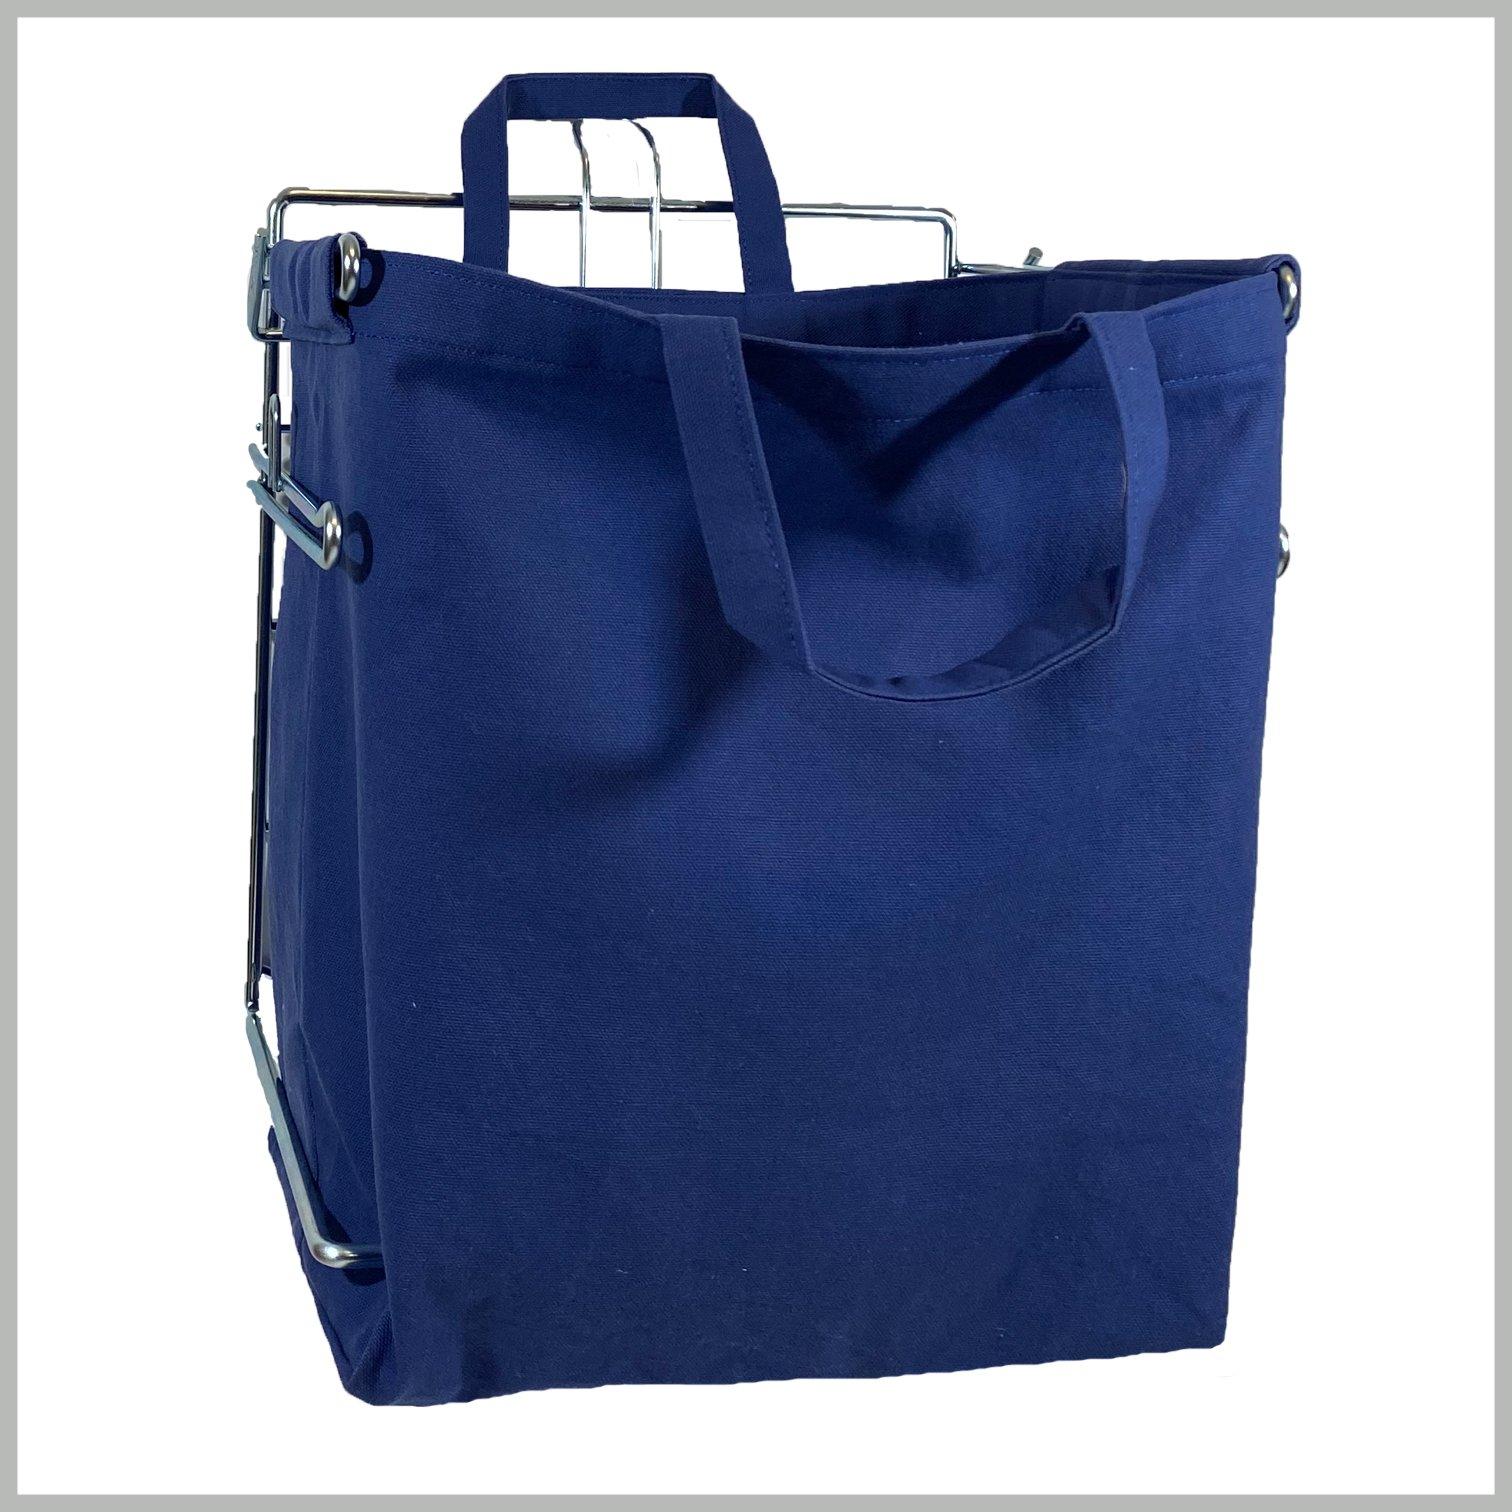 RoyalBlueTote-easybag